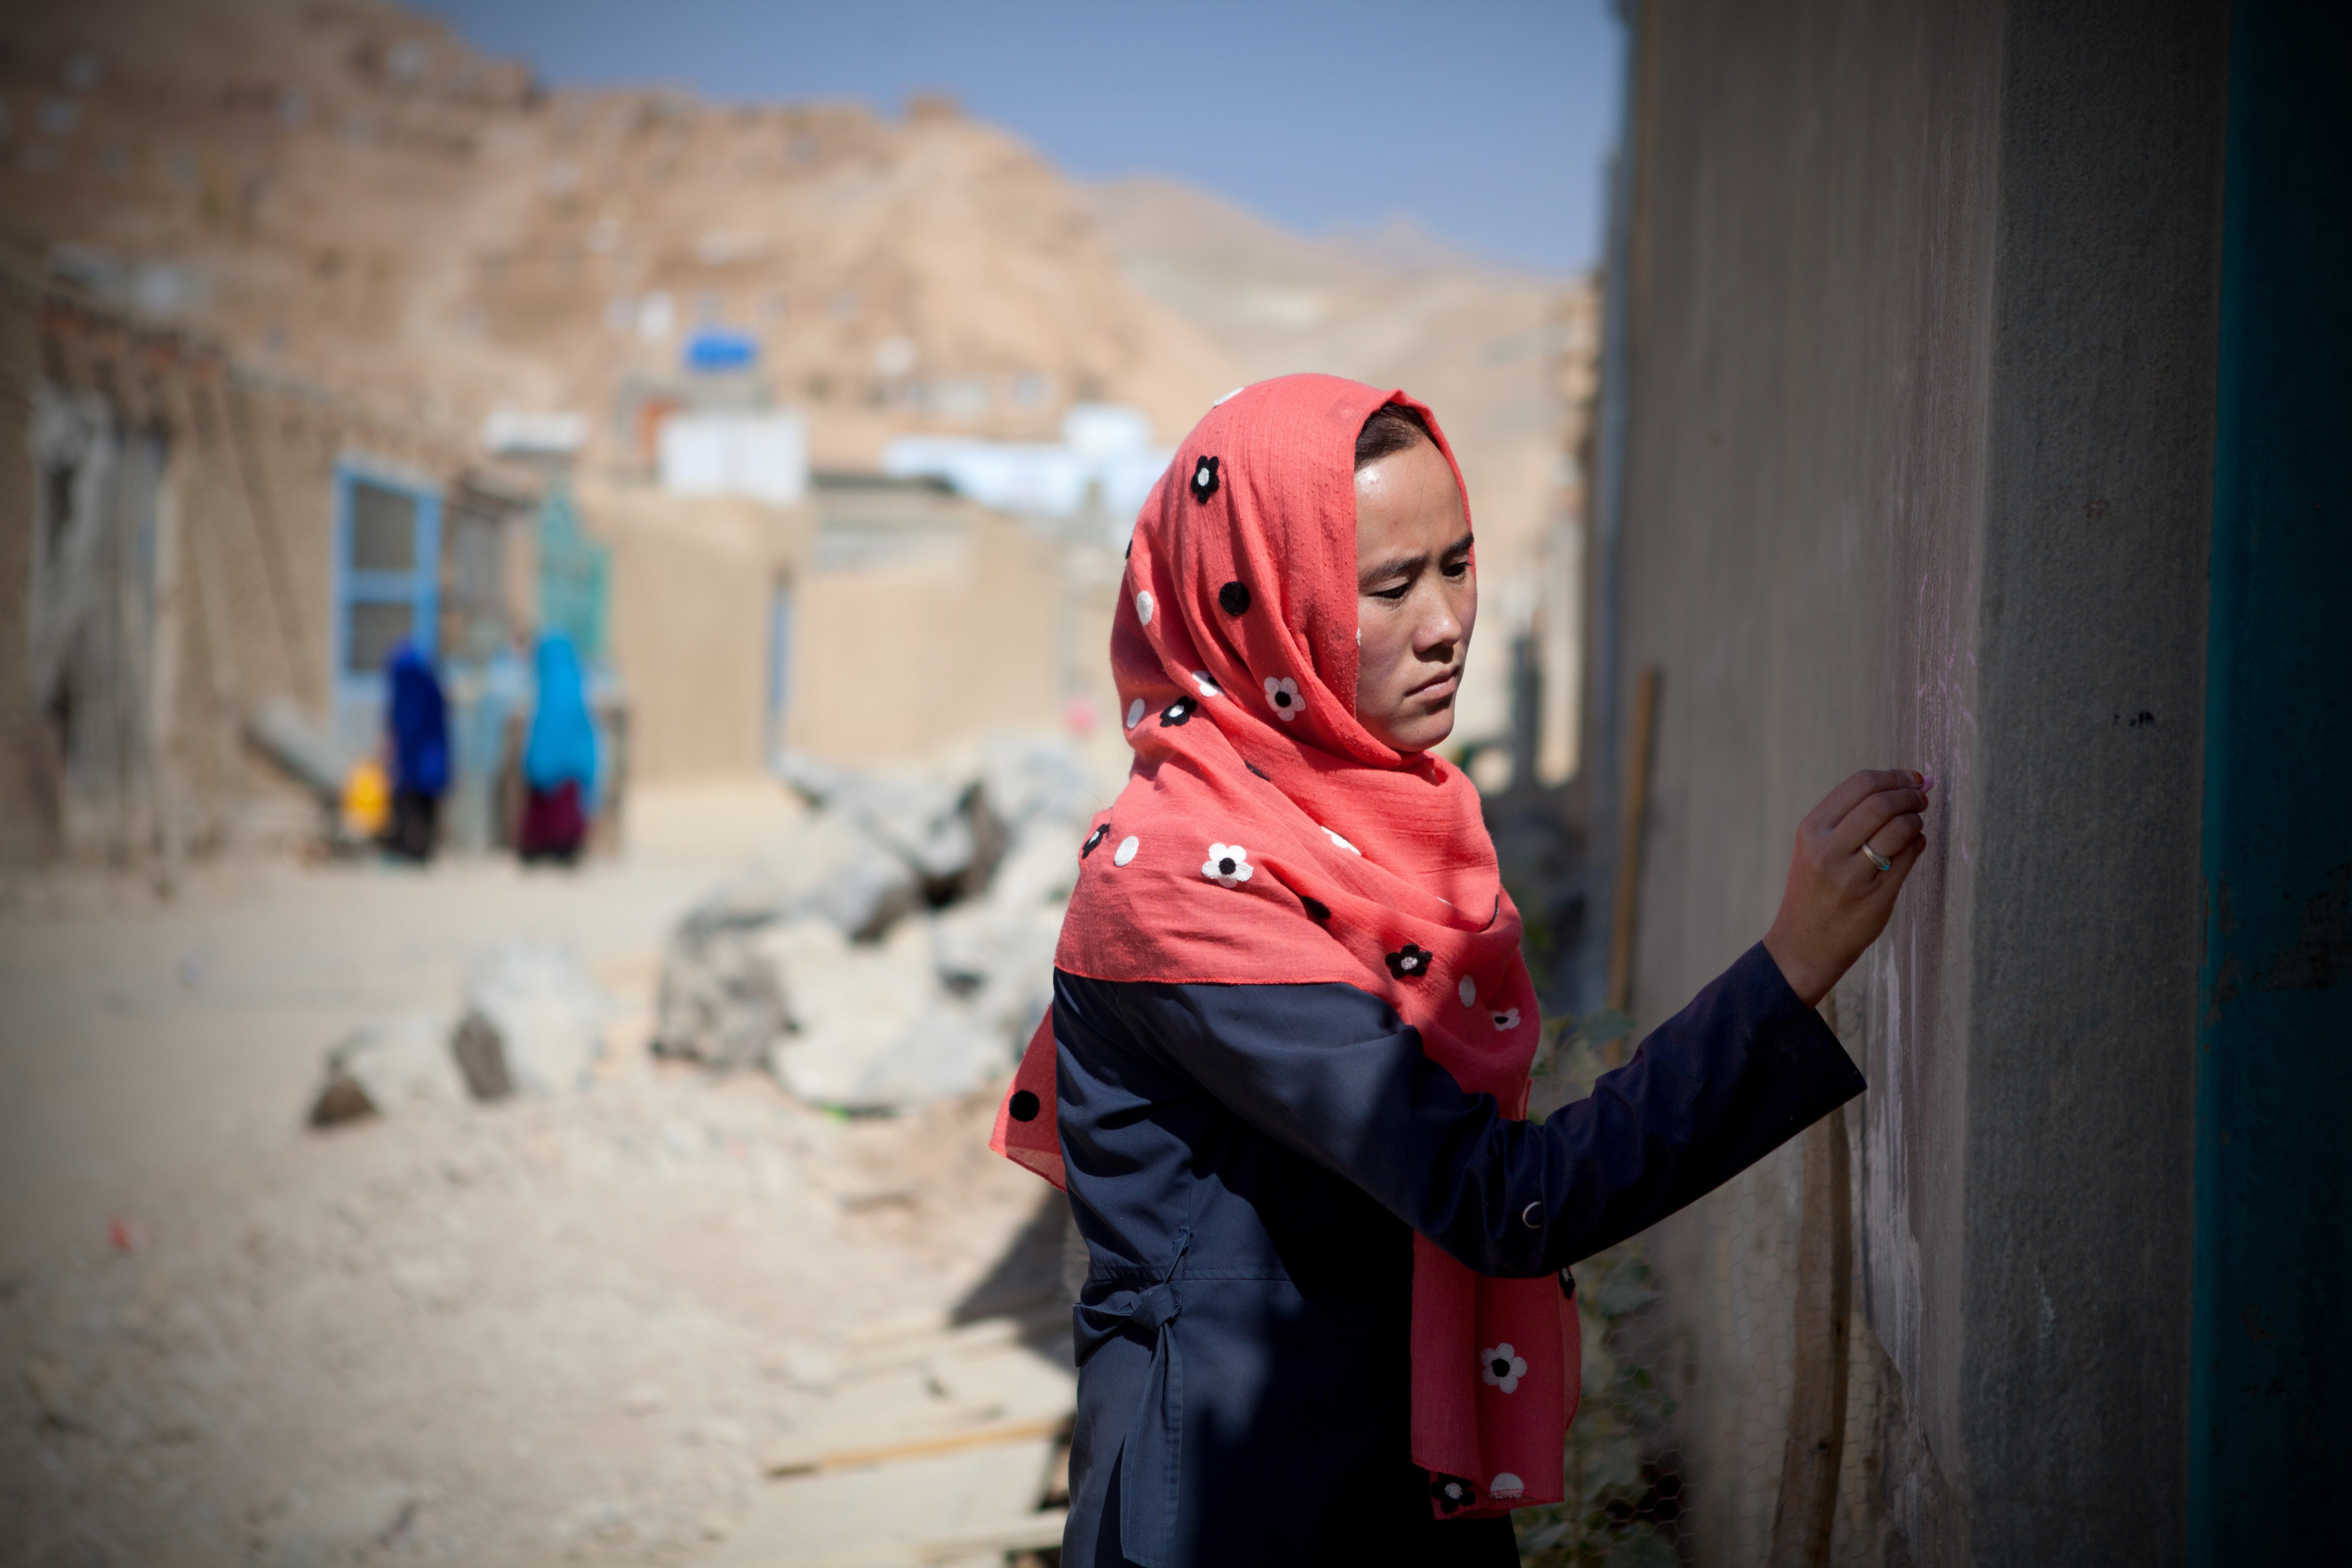 Samima_volunteer_polio_vaccinator_afghanistan